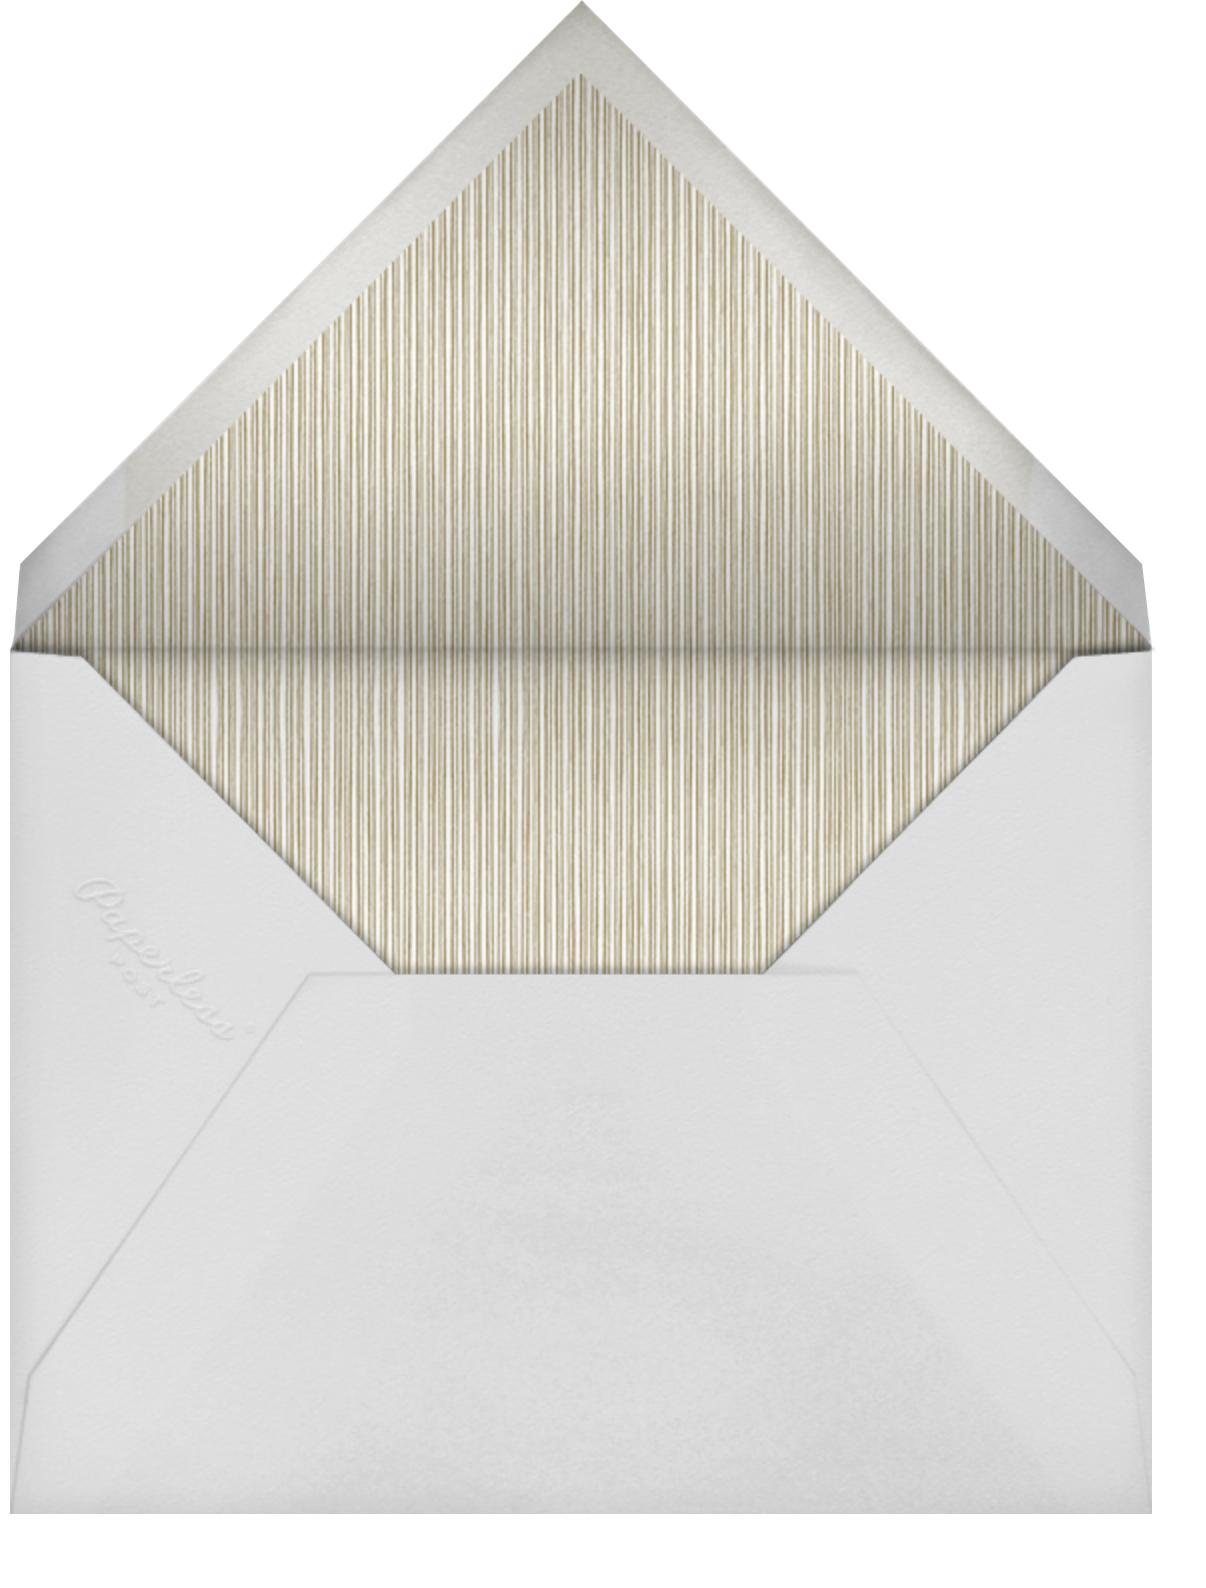 Regency (Tall) - Black - Paperless Post - Memorial service - envelope back